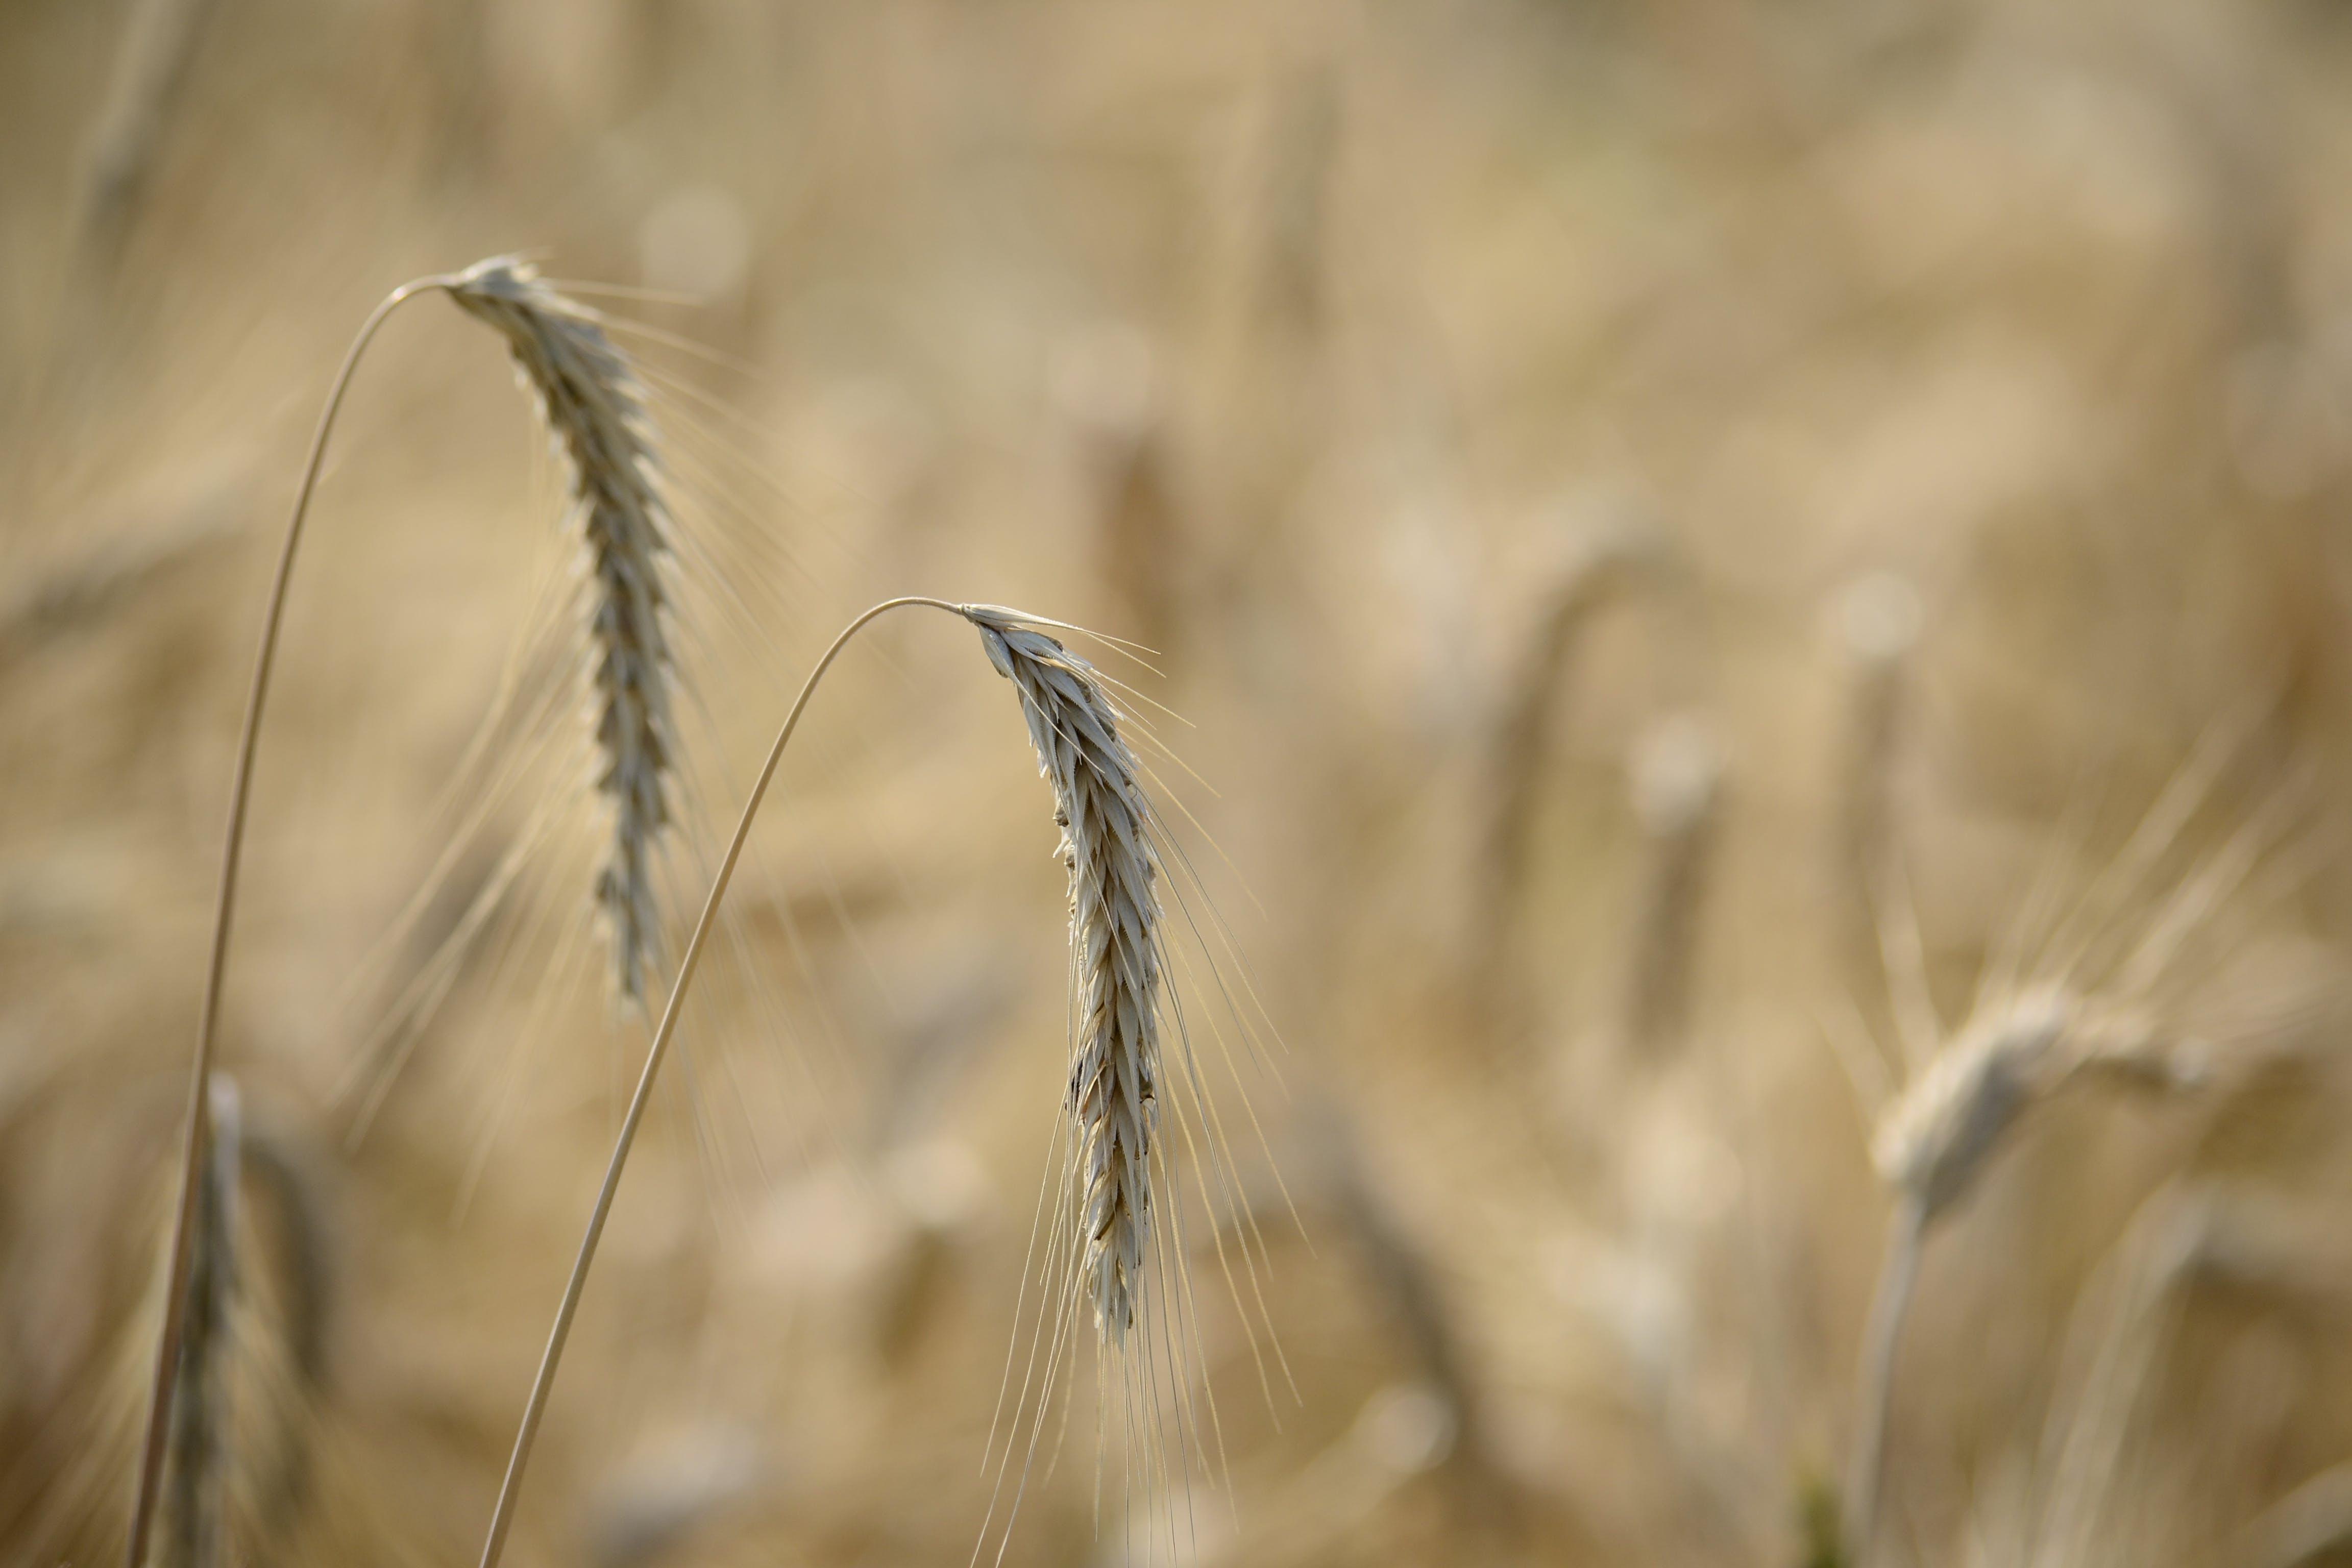 agriculture, barley, blur